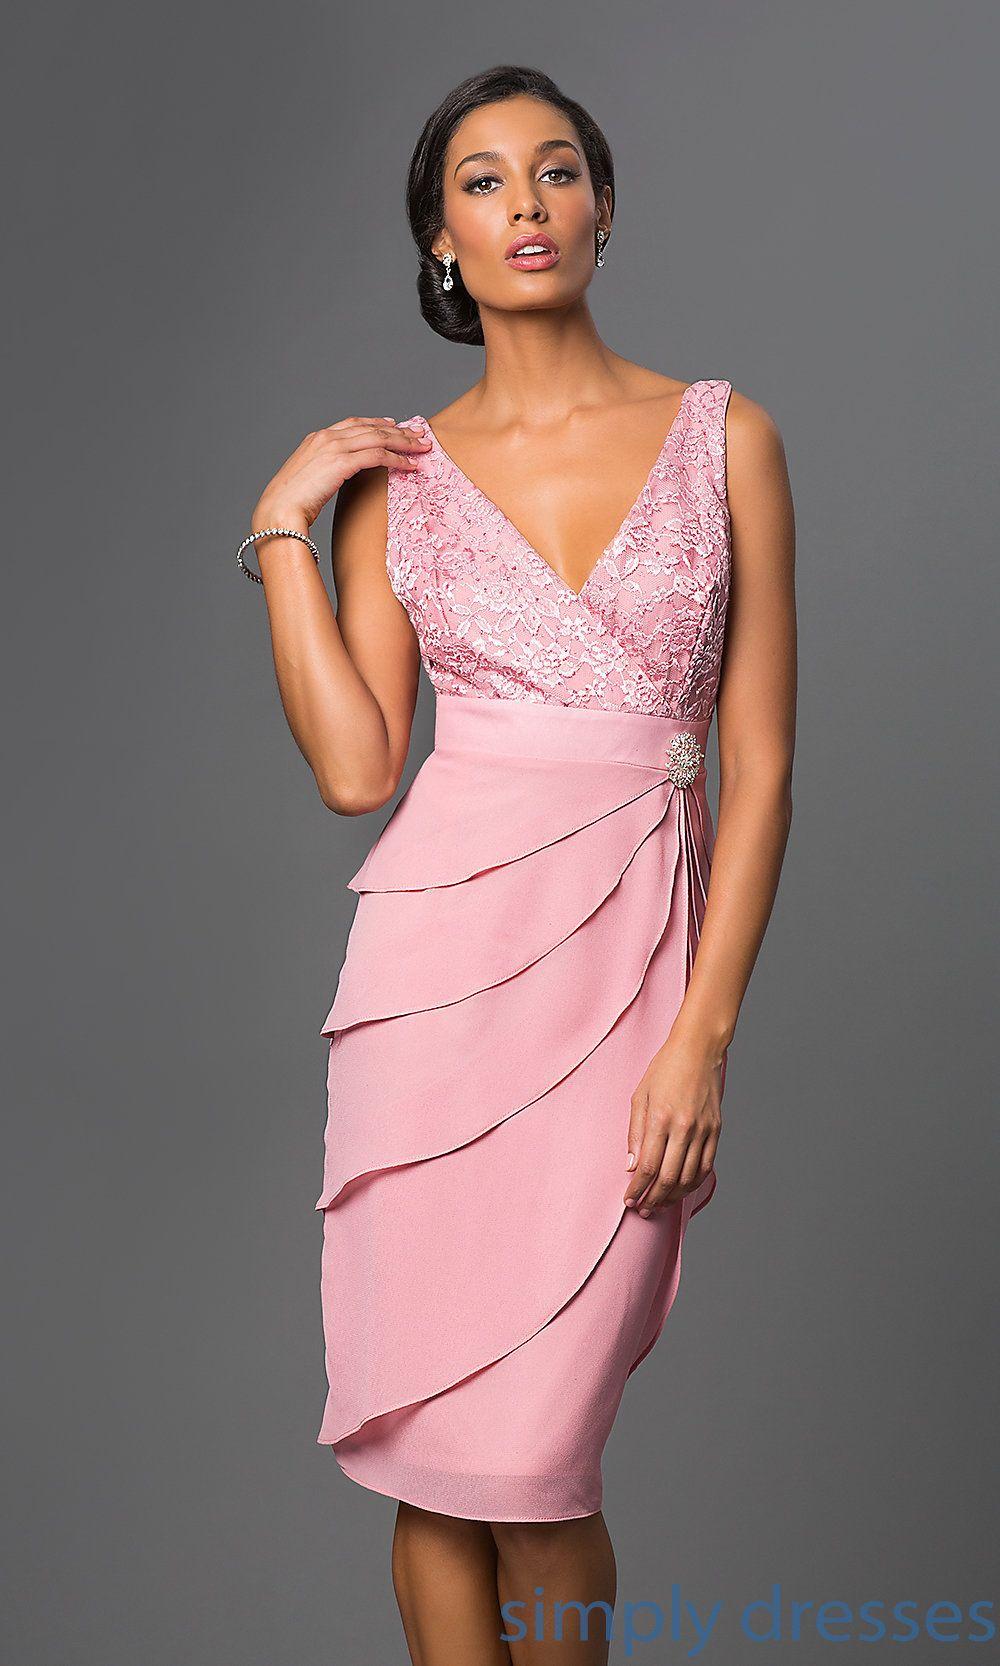 Knee-Length Sally Fashion Dress with Jacket | dresses | Pinterest ...